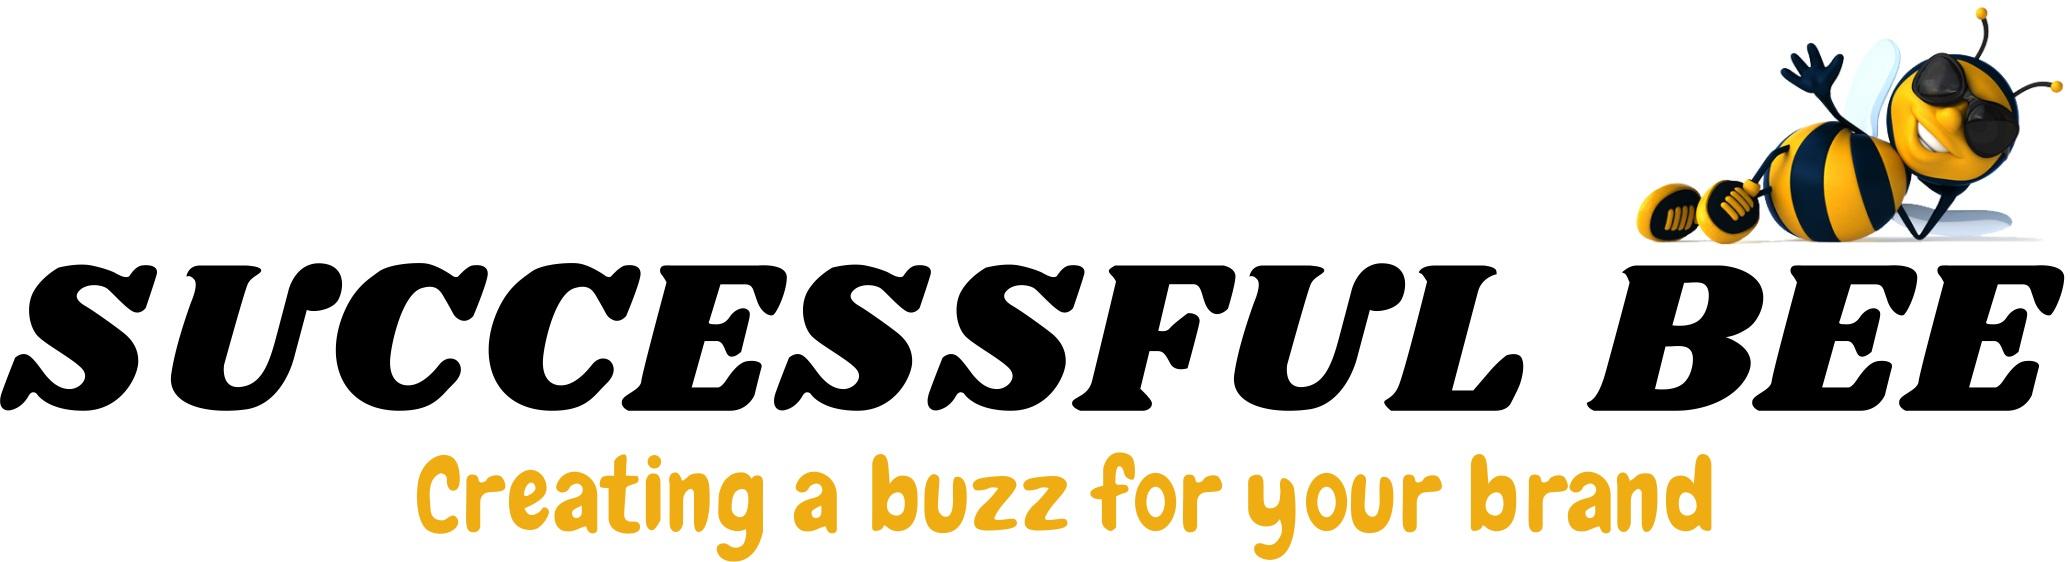 Successful Bee